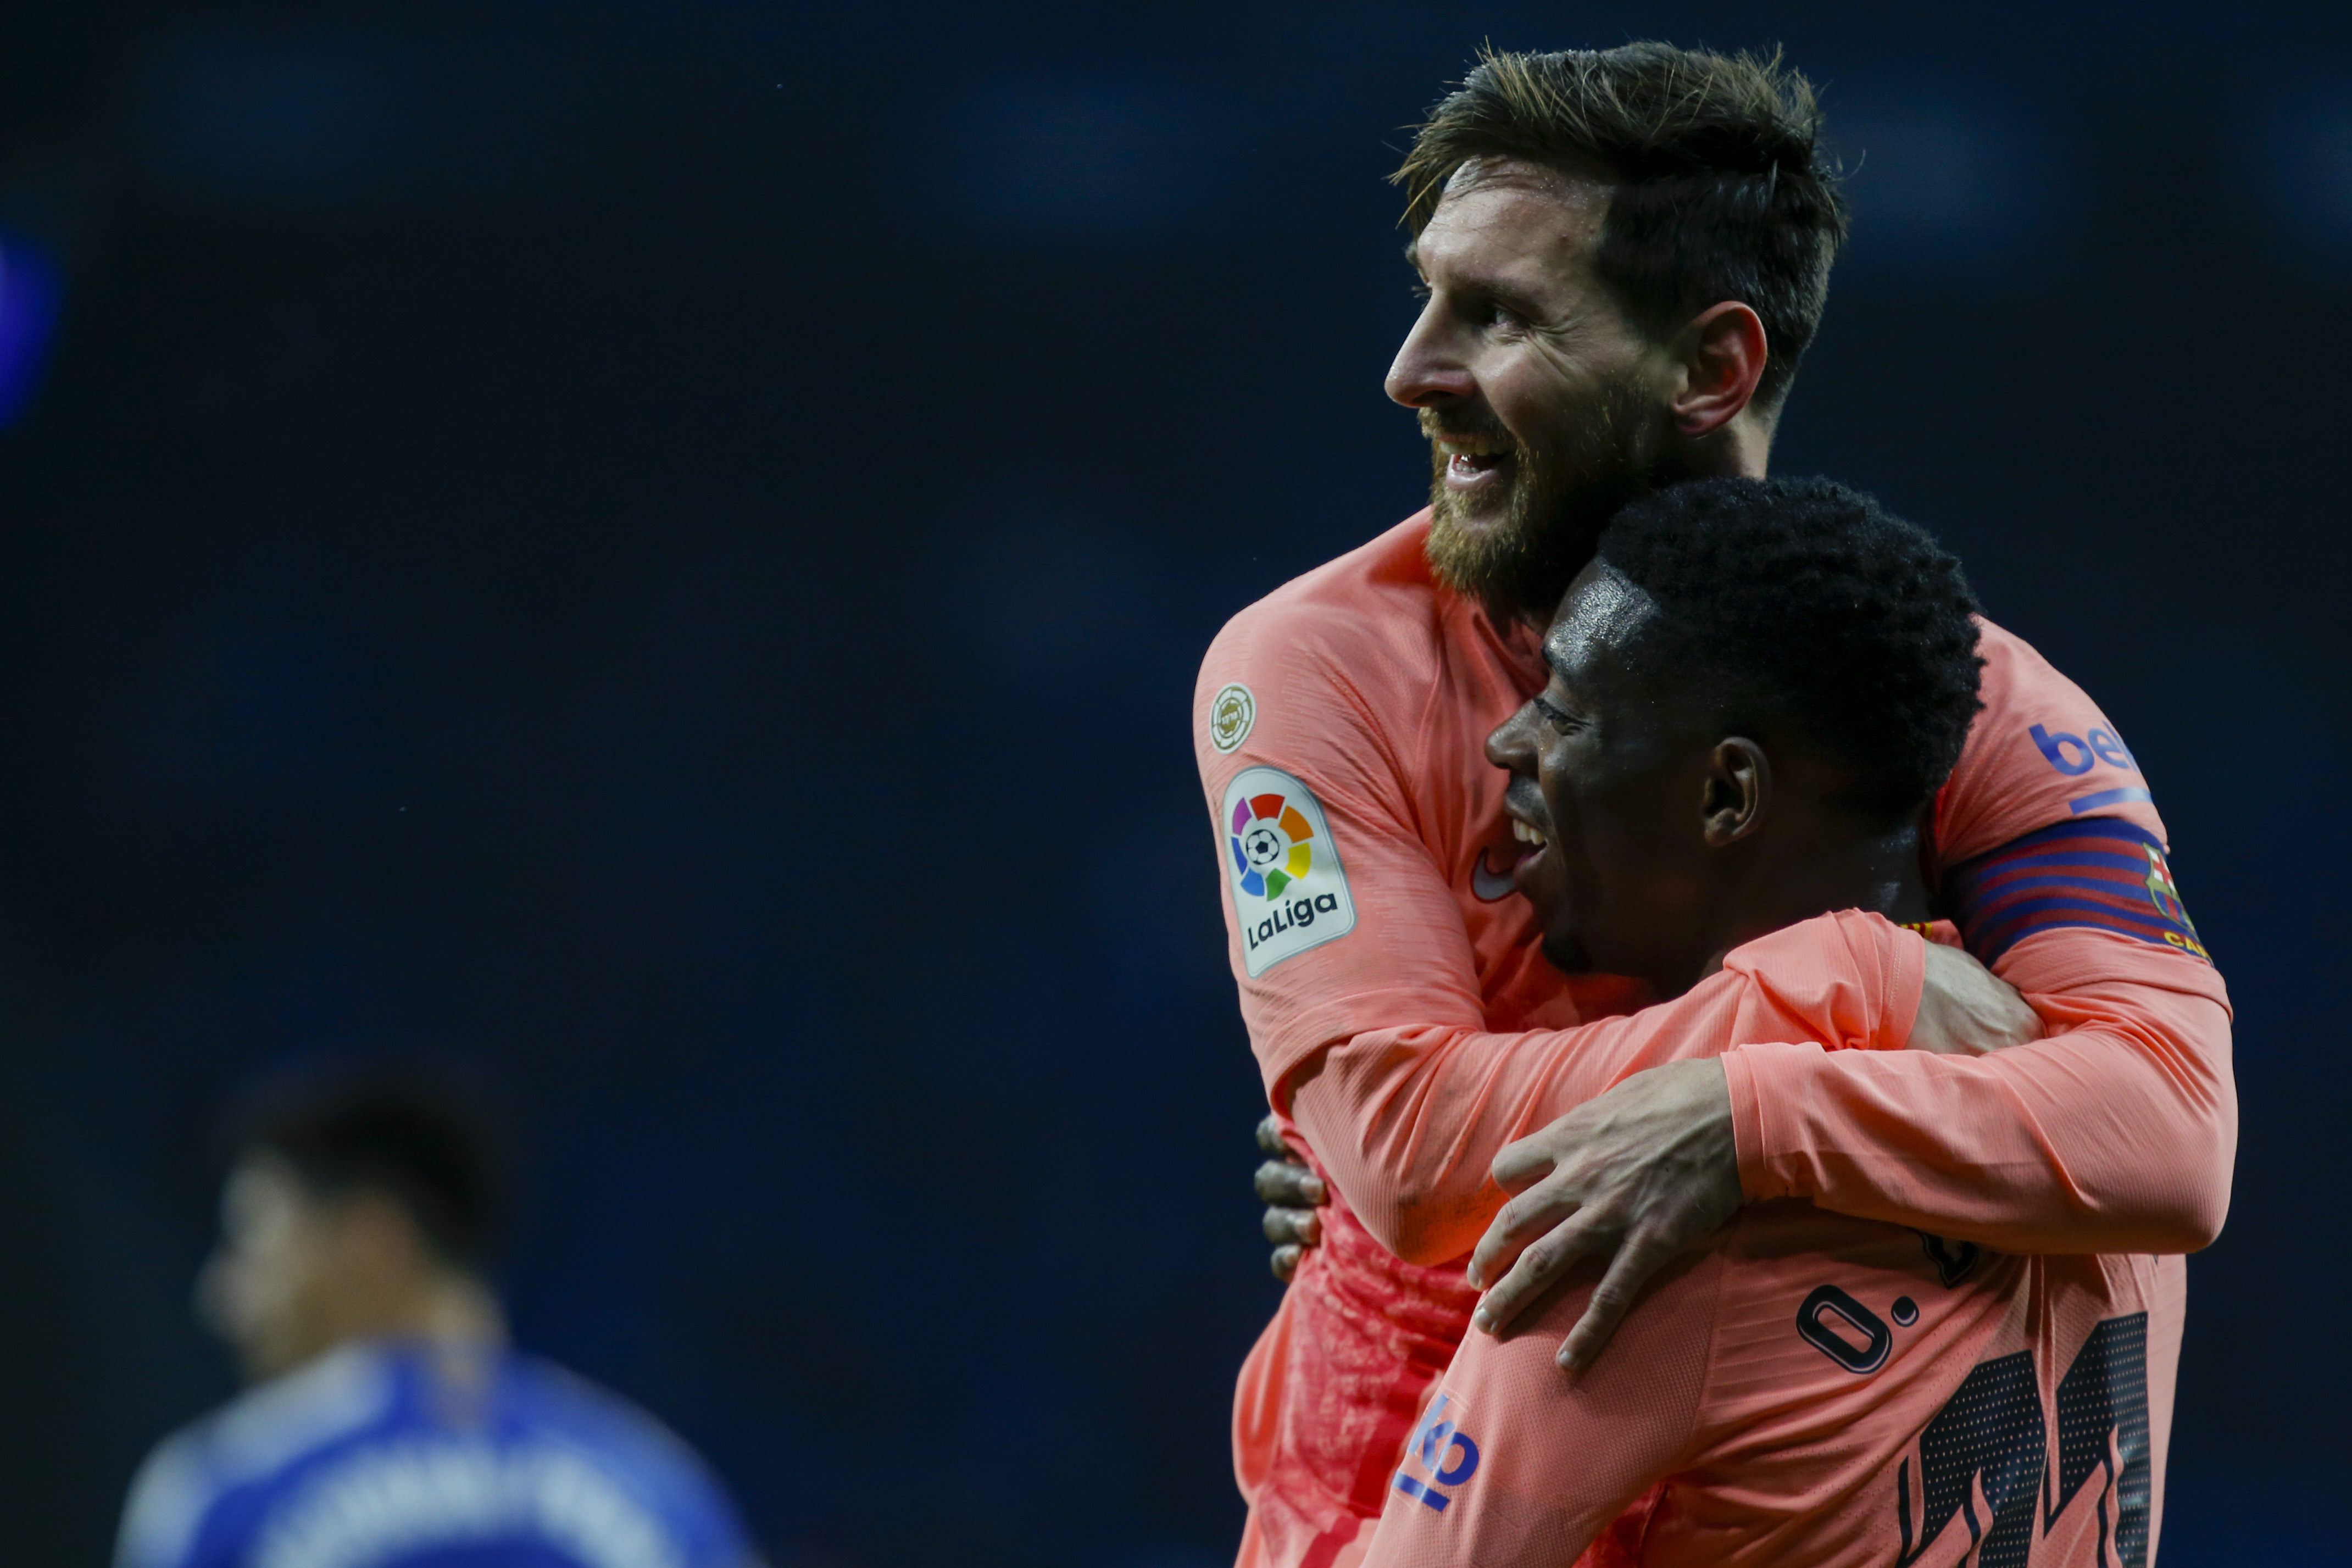 Twitter goes berserk over Lionel Messi's double free-kick goals against Espanyol